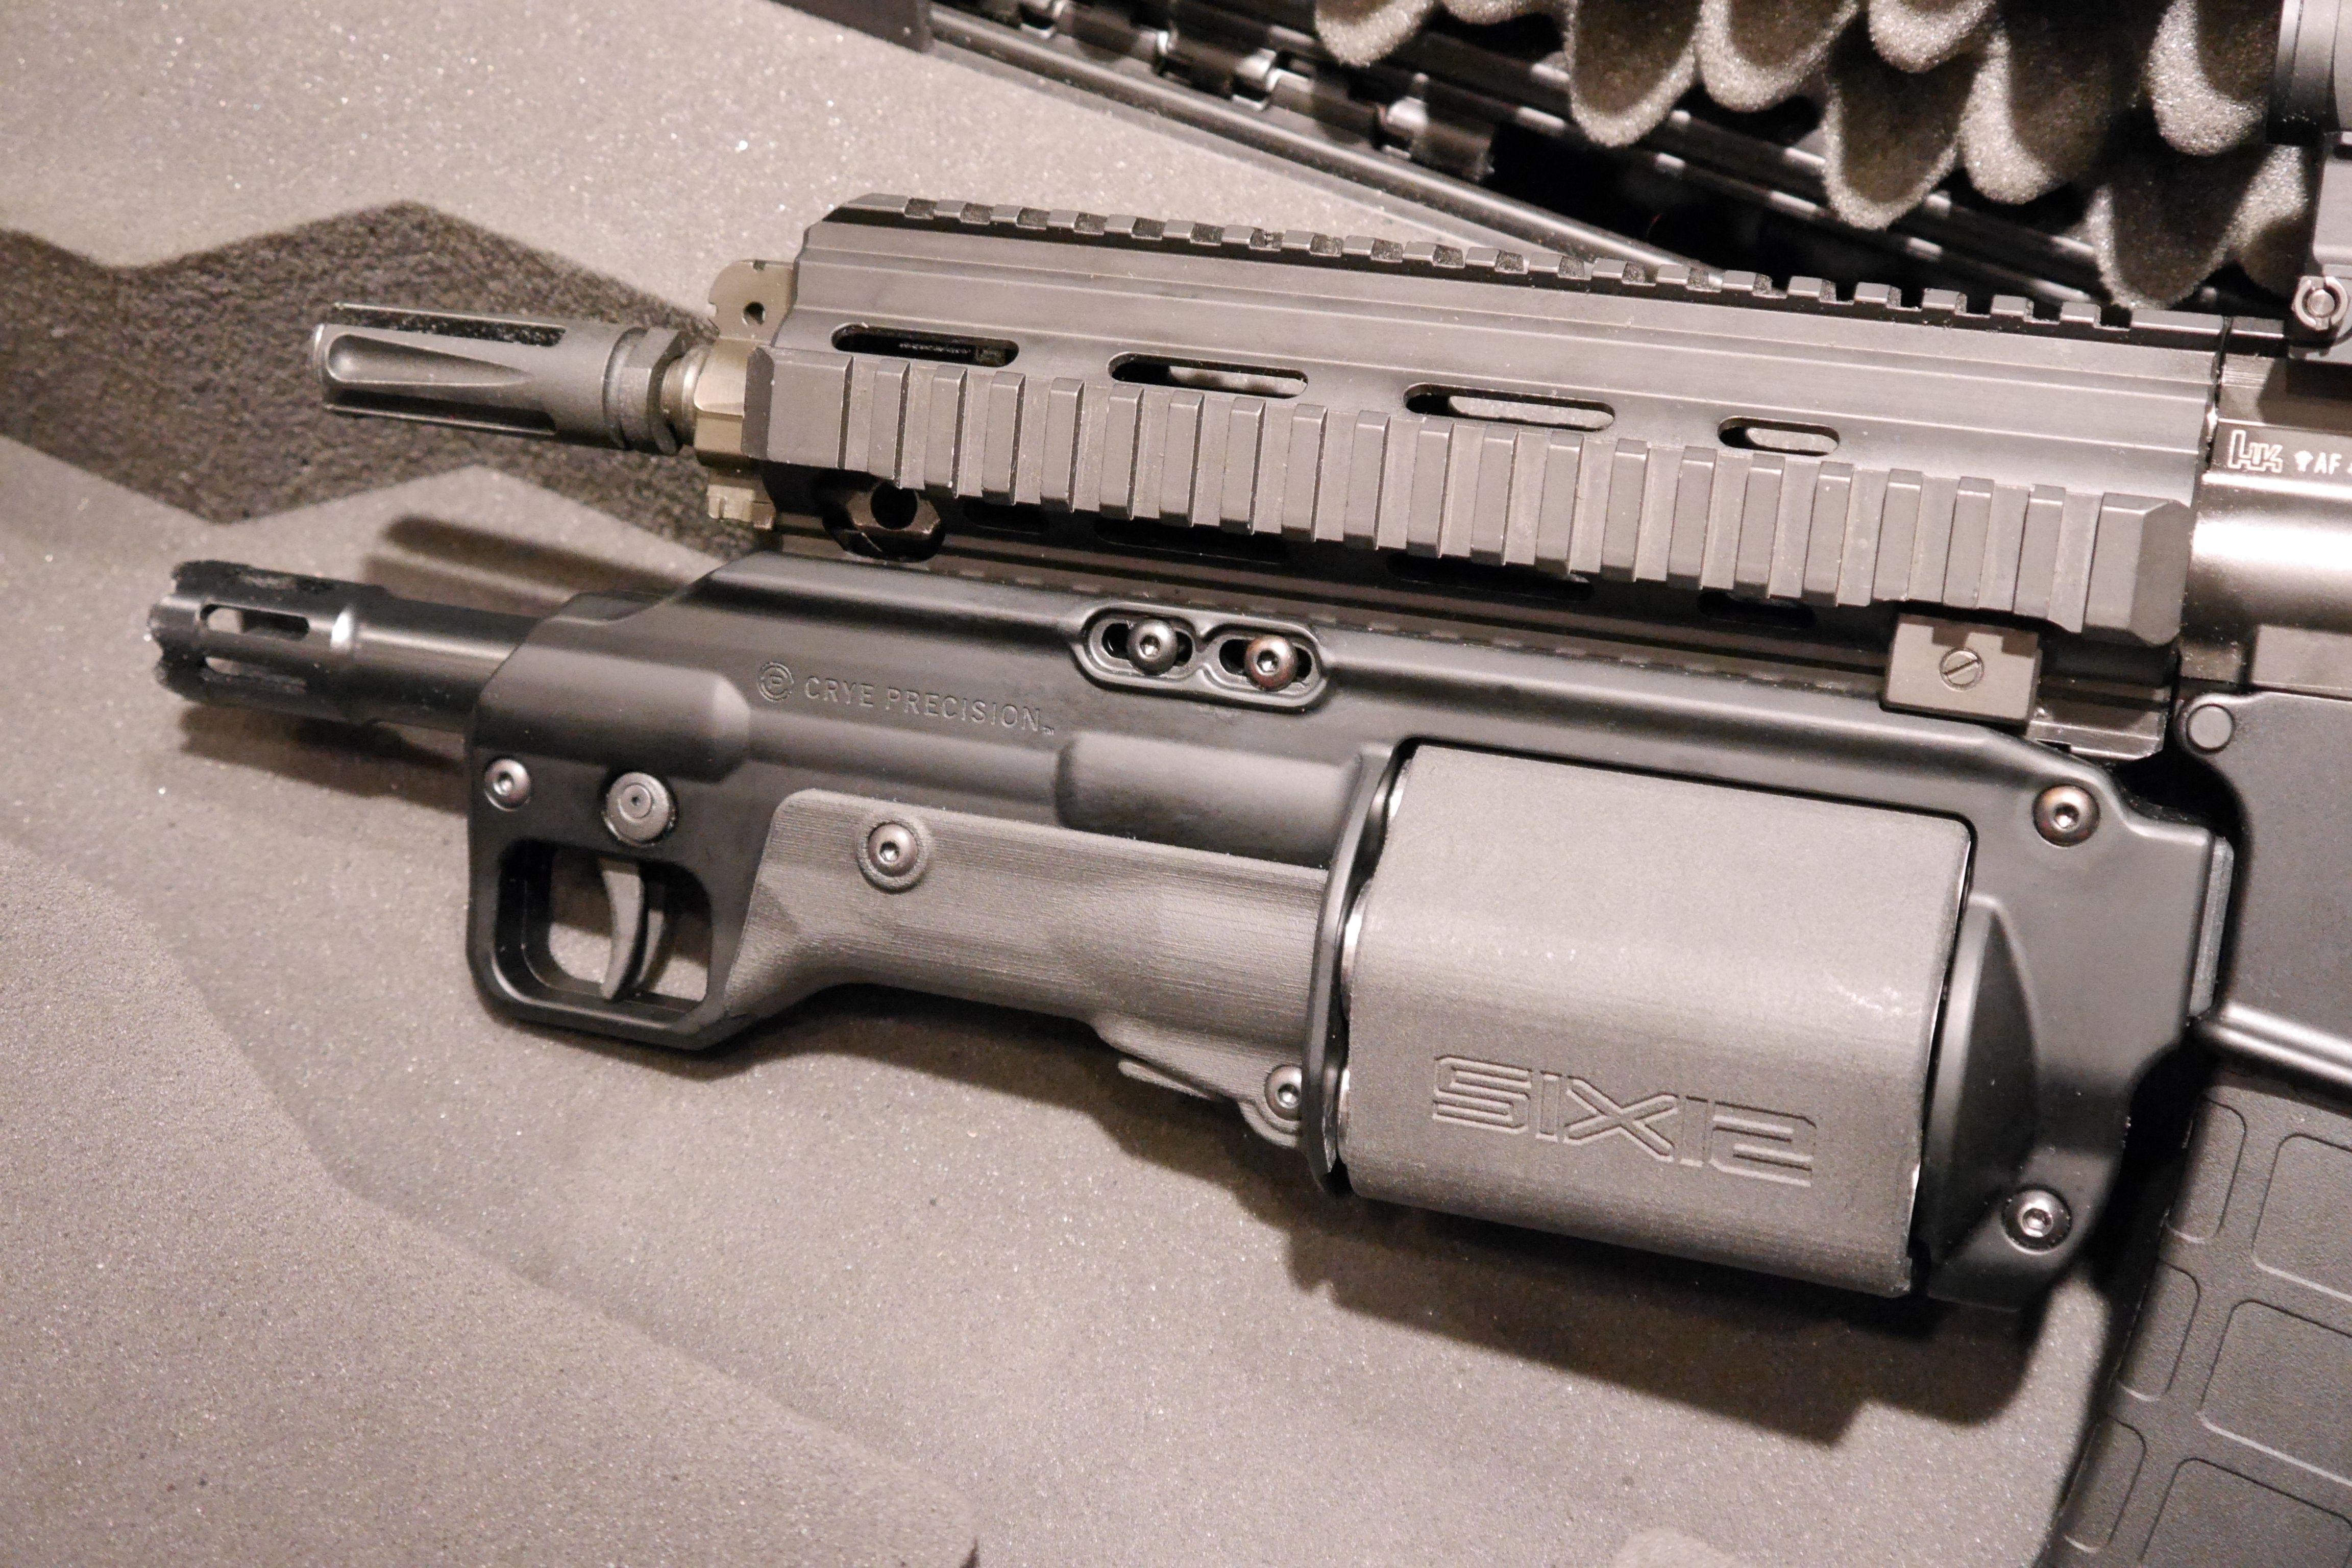 Crye Precision Six12 Shotgun Shot show Pinterest